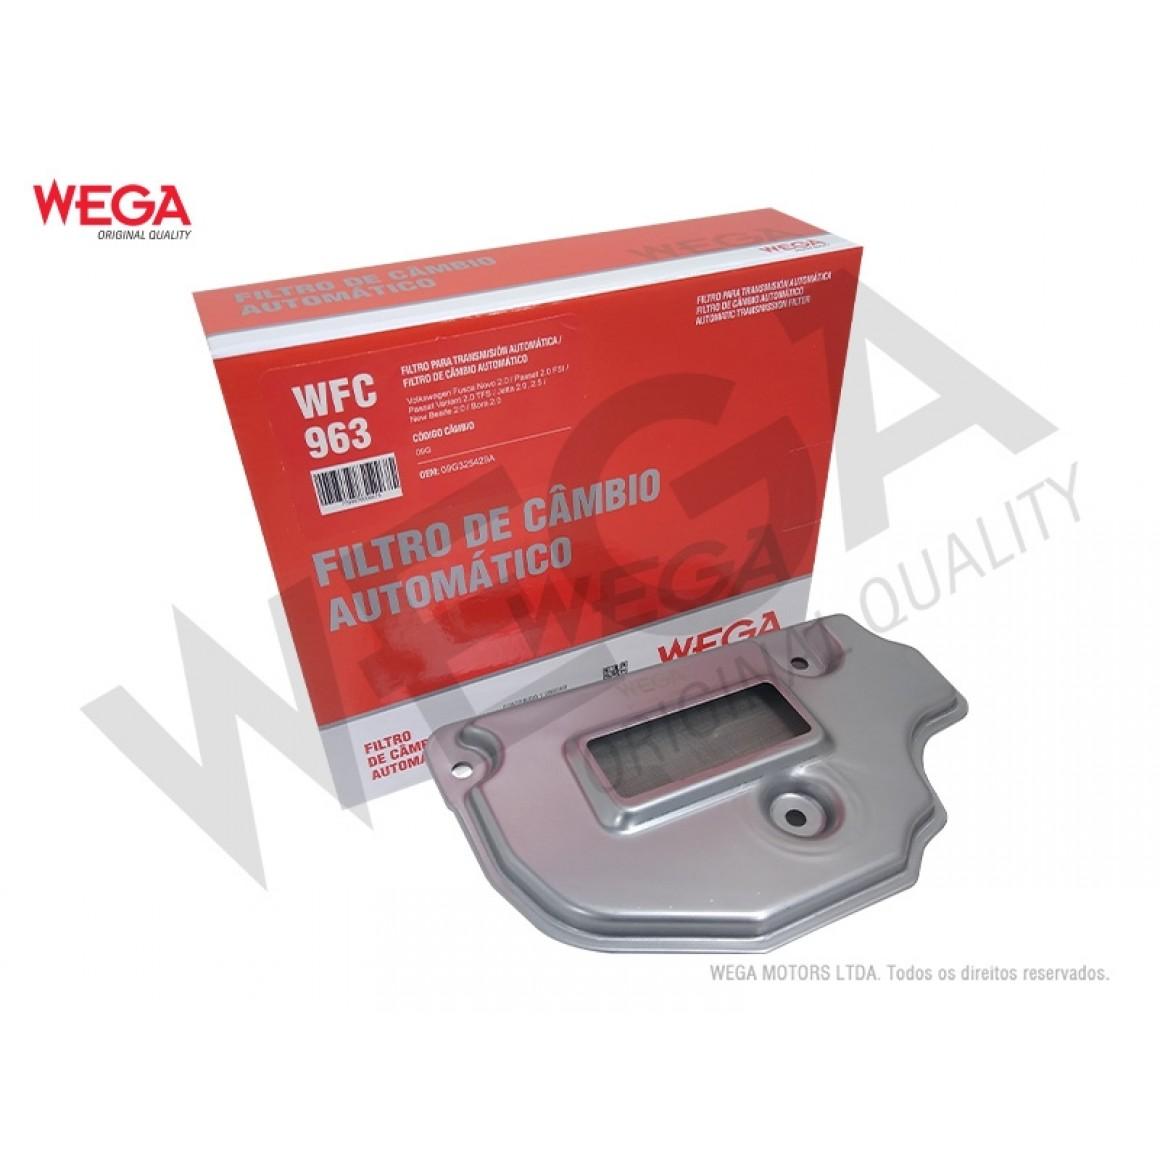 Filtro Câmbio Automático Bora New Beetle Passat Wega Wfc963